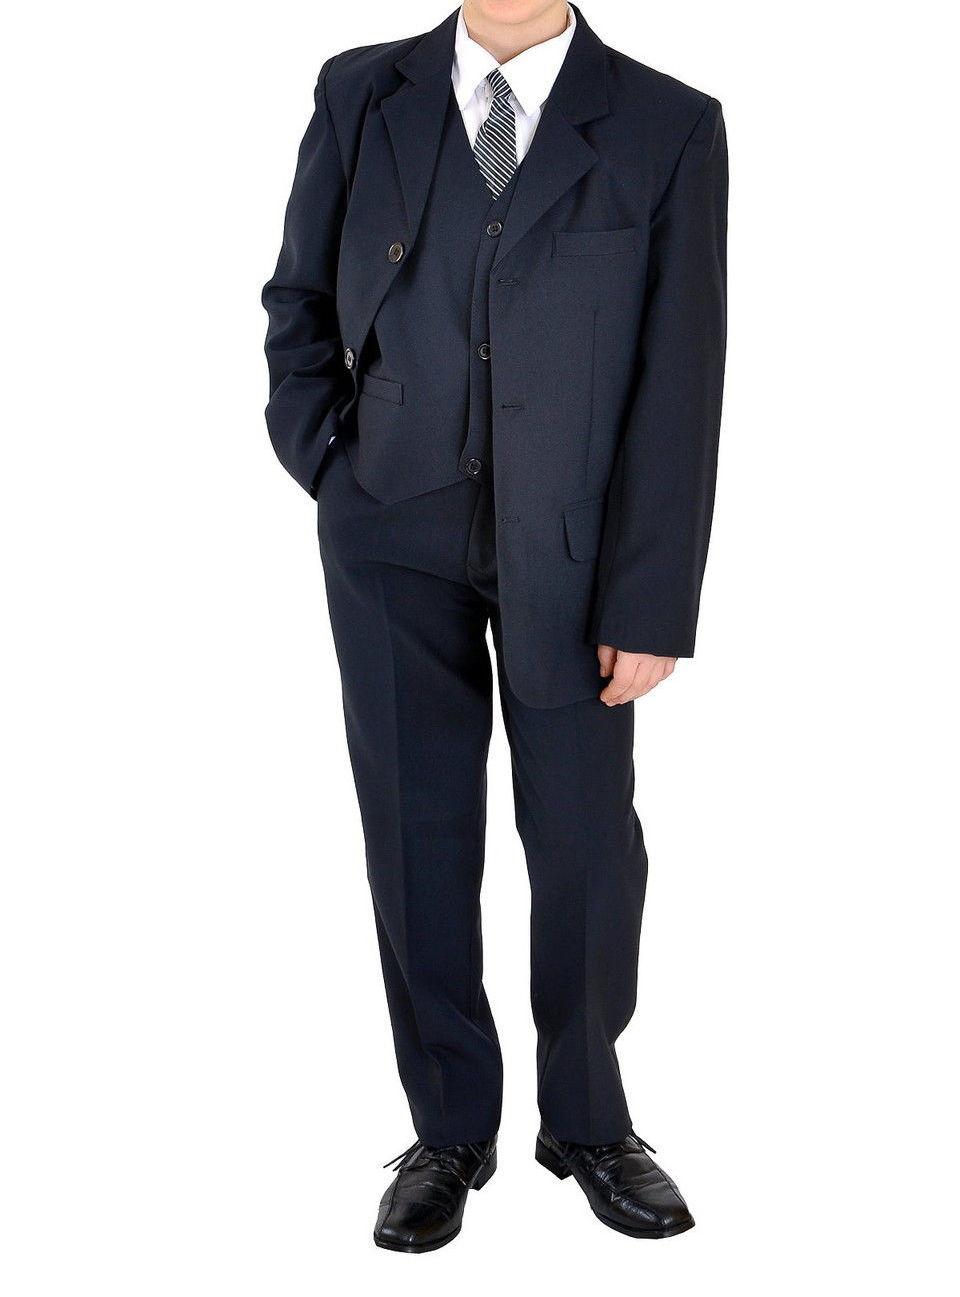 5tlg Jungenanzug Jugendanzug Konfirmationsanzug Firmung Gr.164-176 uni blau